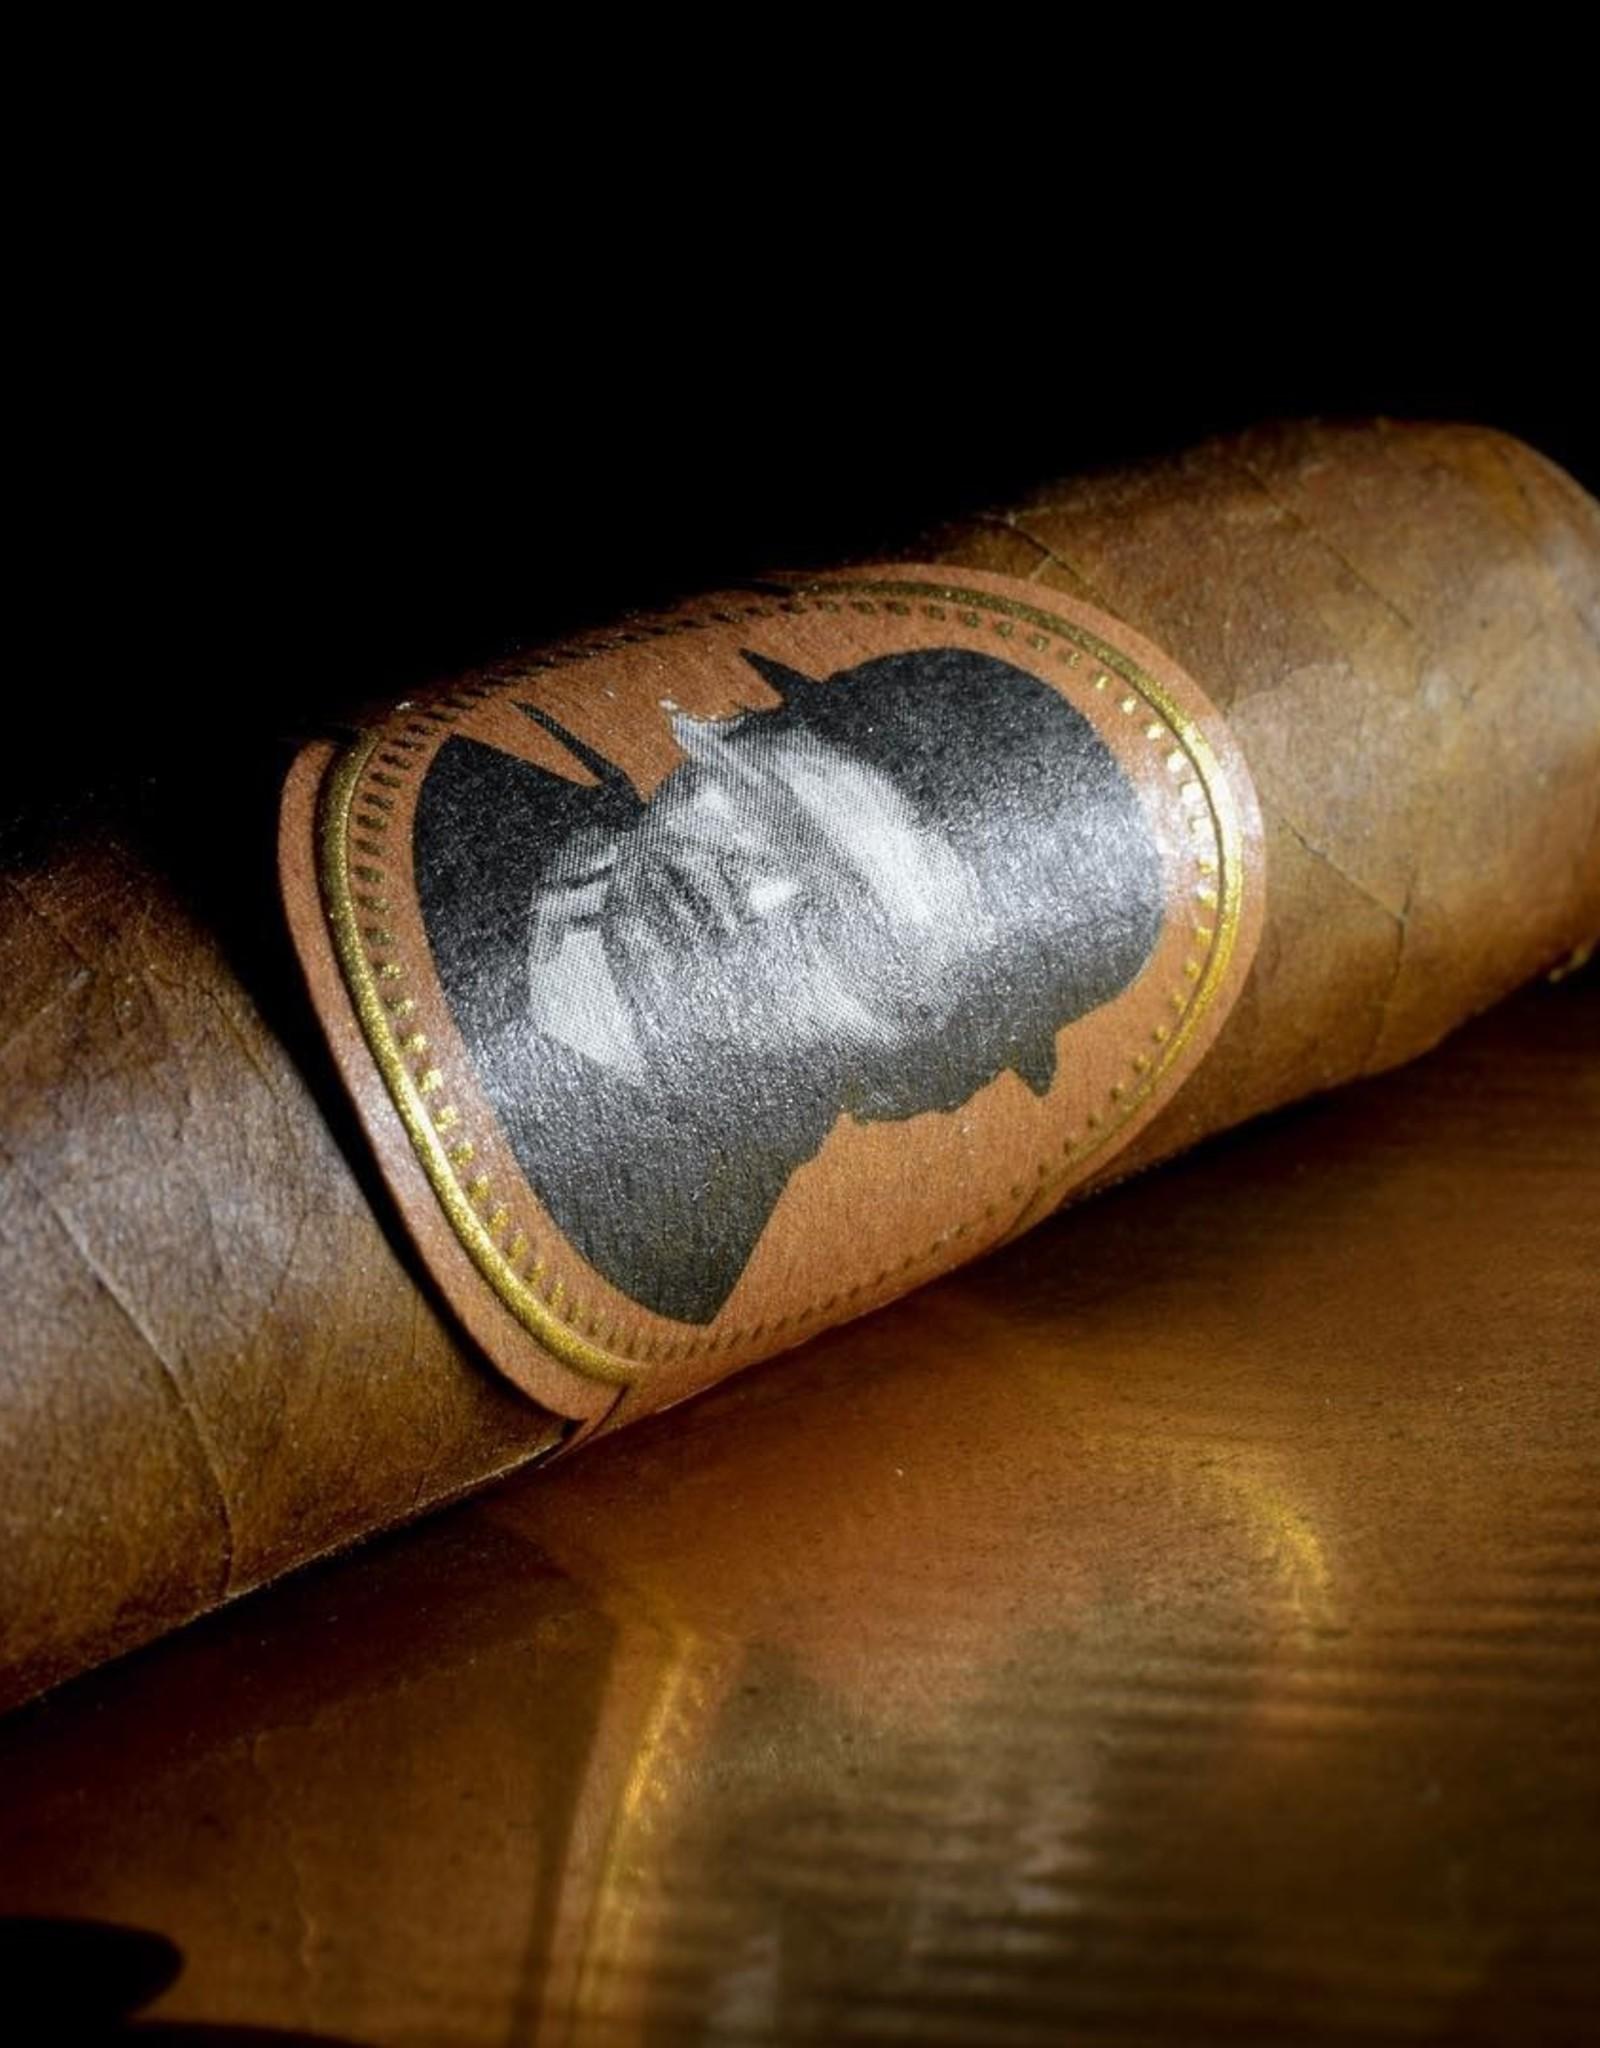 Caldwell Cigar Co Caldwell Blind Man's Bluff Habano Robusto 5 x 50 Single